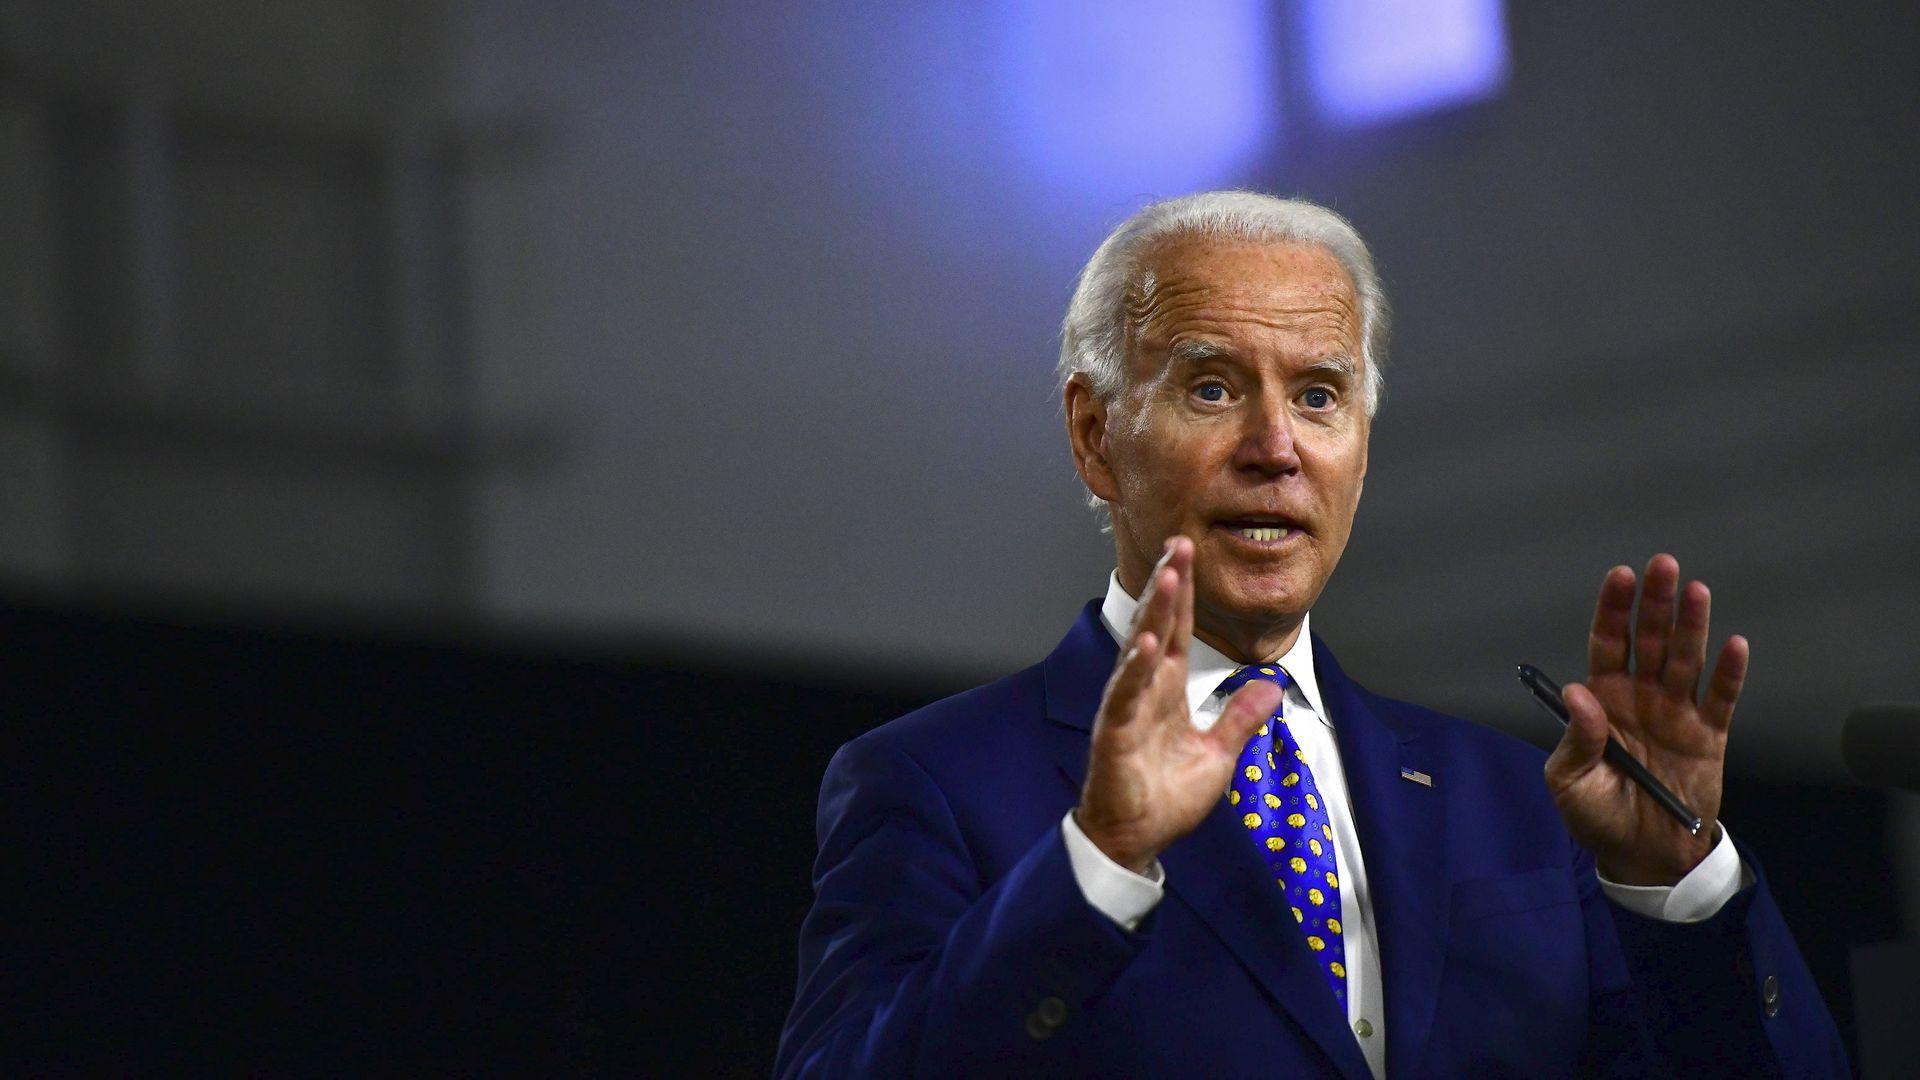 Joe Biden will no longer travel to Milwaukee for Democratic convention - Axios 5